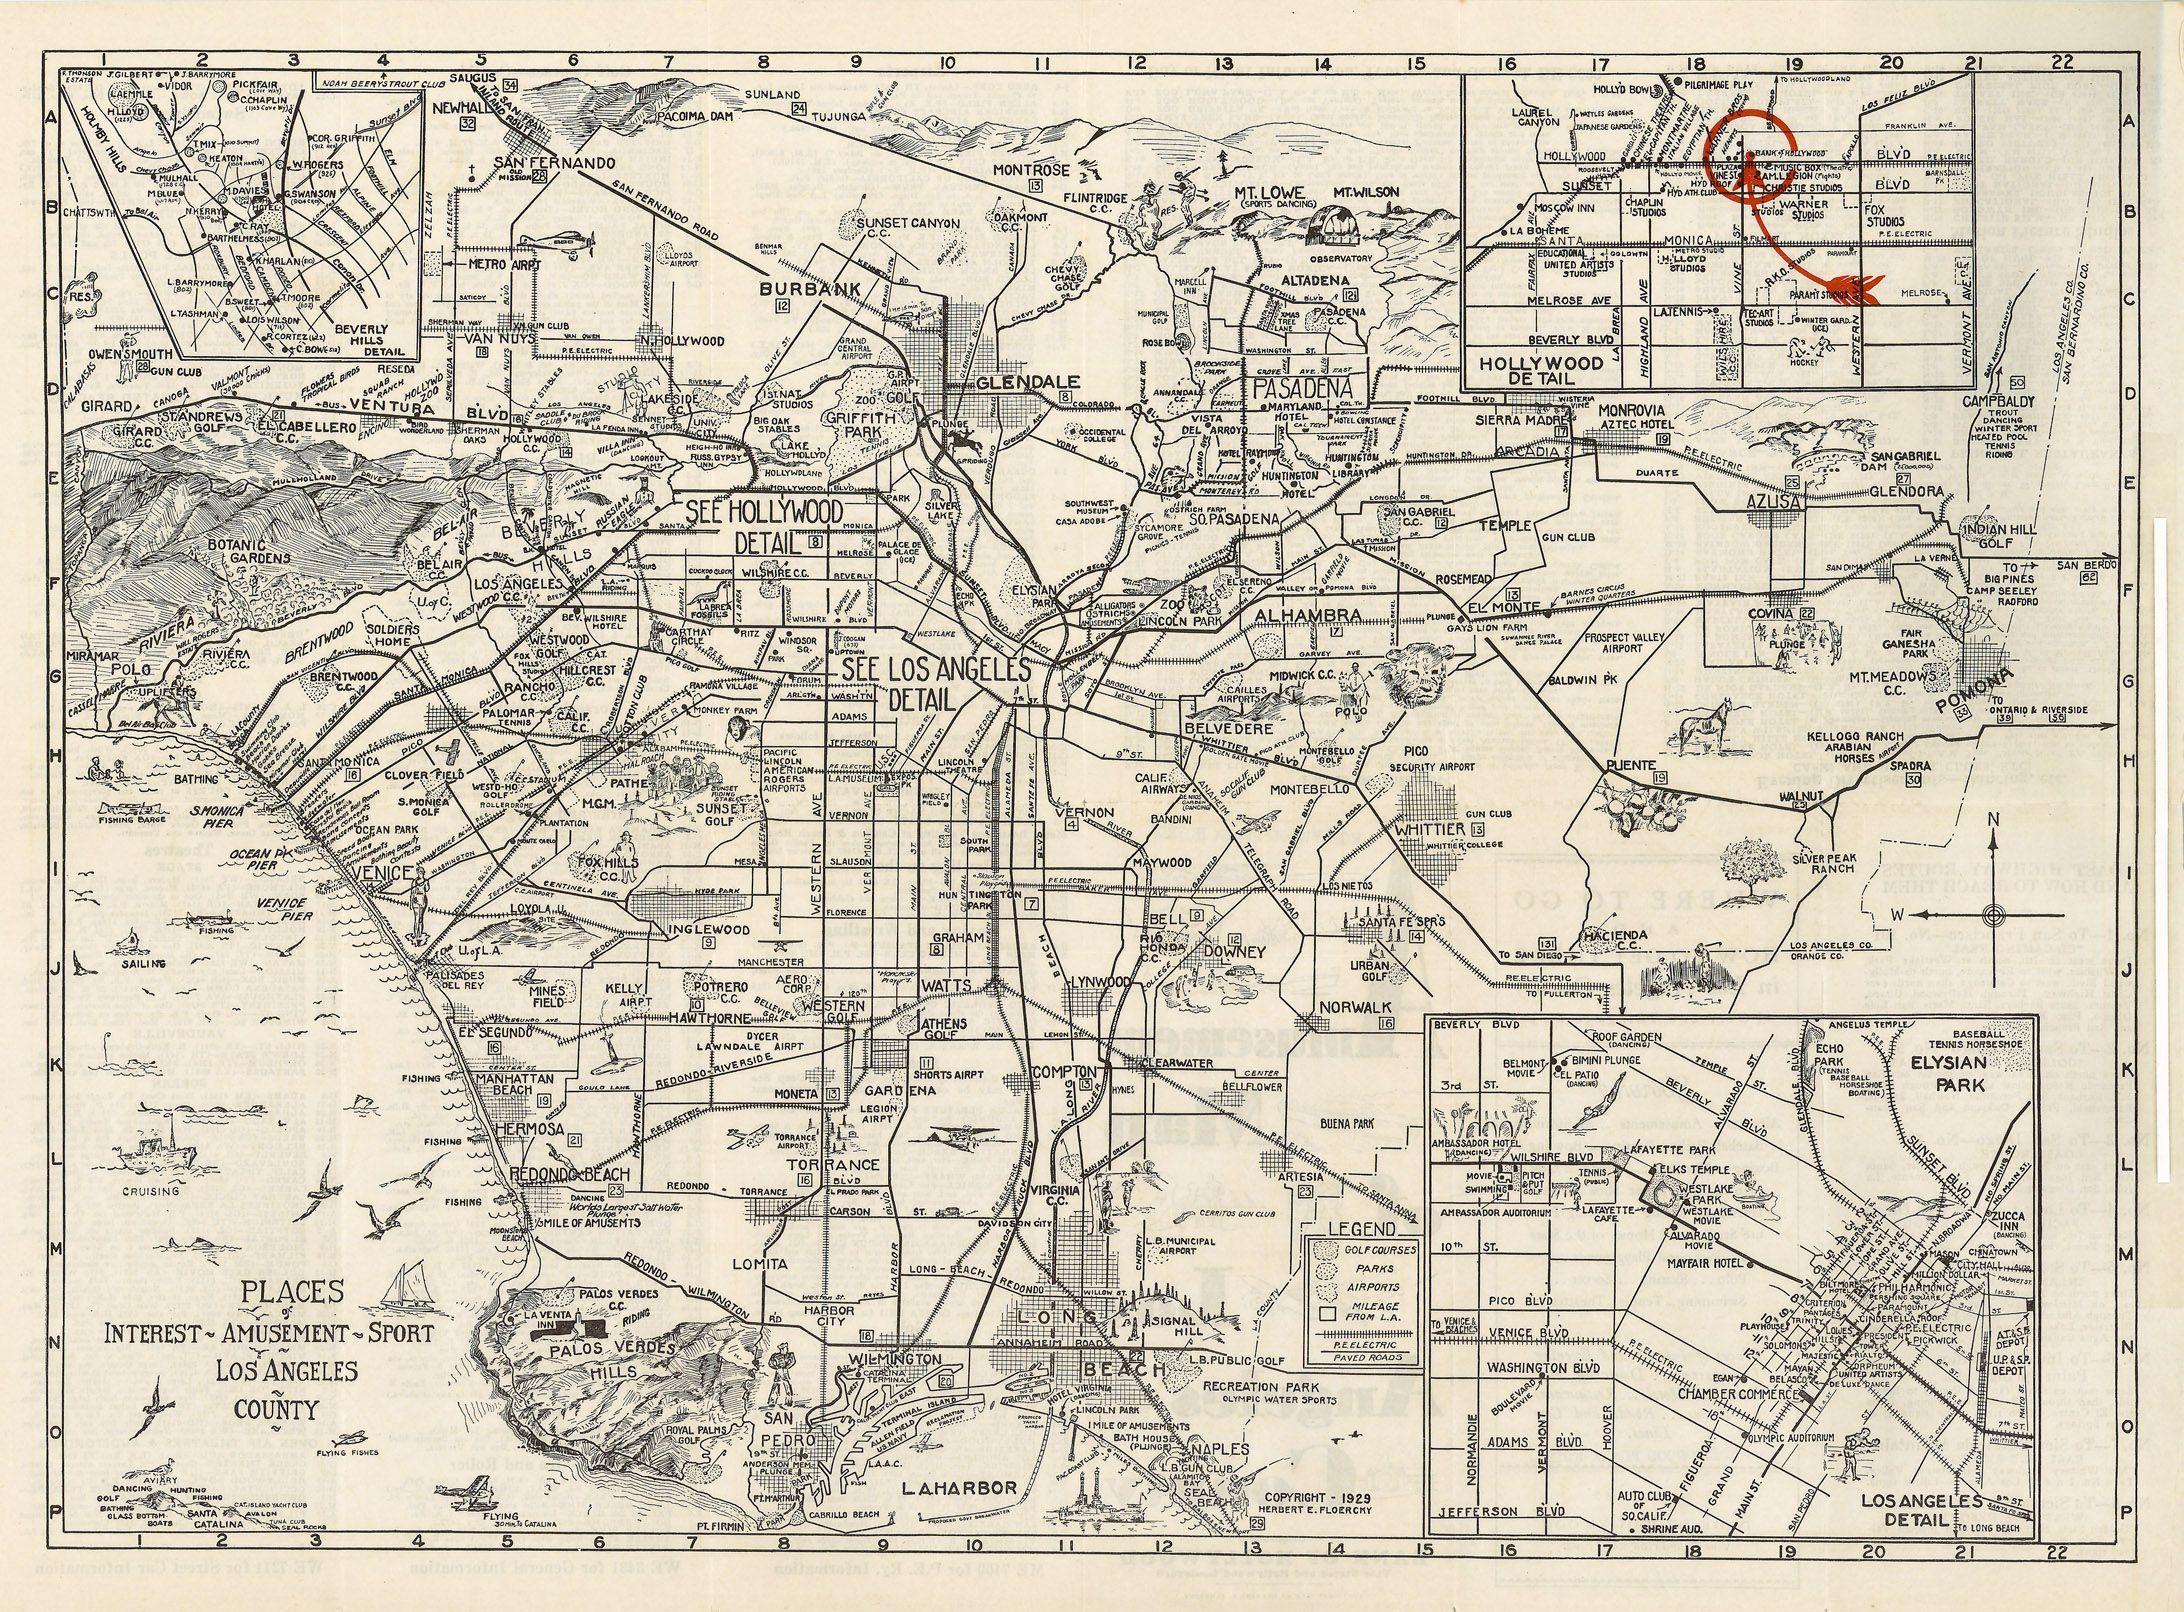 noirish Los Angeles - Page 476 - SkyserPage Forum in ... on hollywood boulevard map, santa clarita map, mulholland drive map, san fernando freeway map, calabasas map, city of san fernando map, gold line map, san fernando bus map, pasadena map, north hollywood shootout map, van nuys airport map, san fernando ca map, california state route 138 map, universal studios hollywood map, los angeles river map, i-5 map, bob hope airport map,